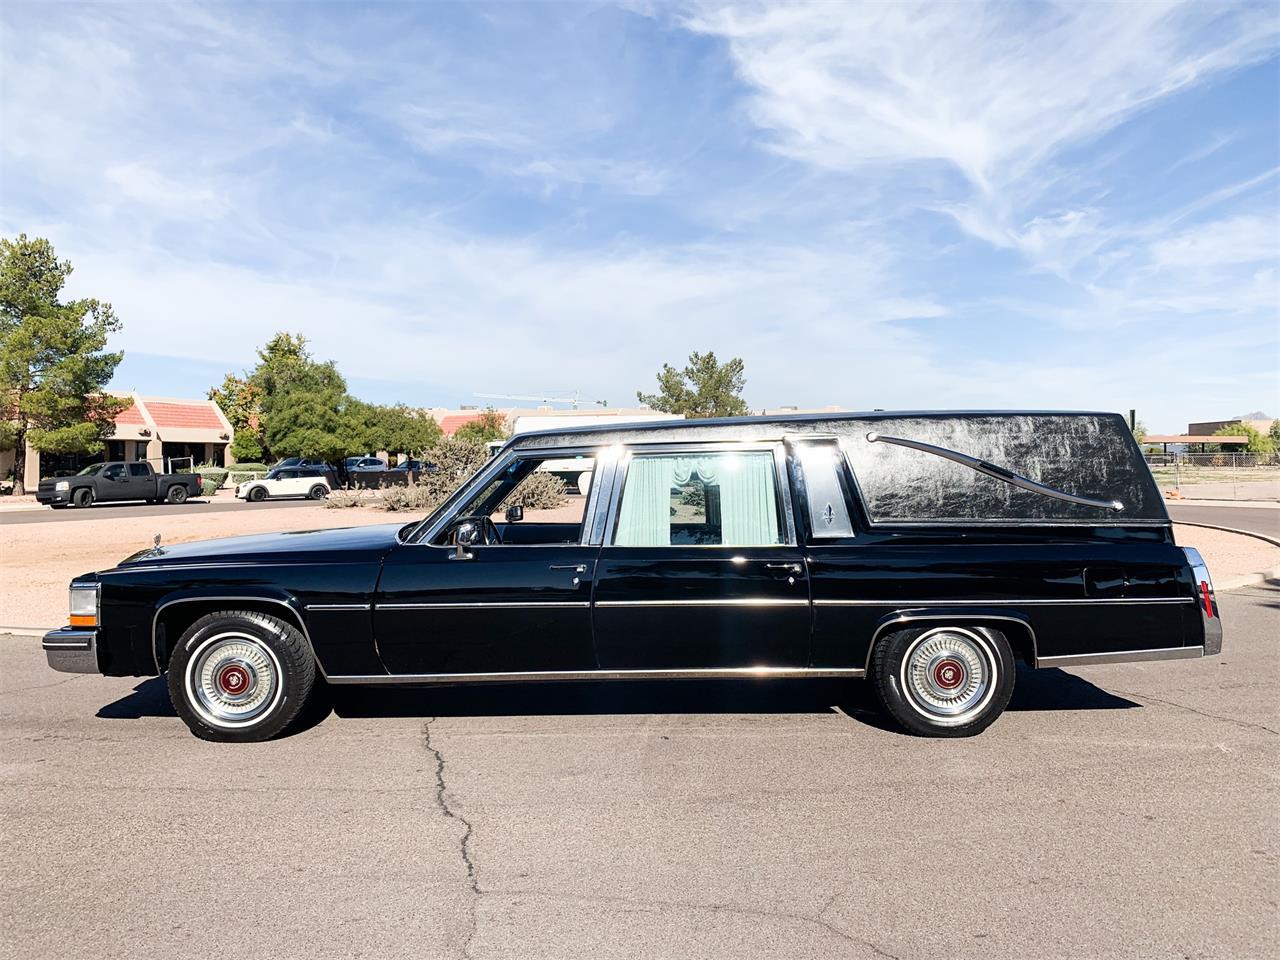 For Sale: 1980 Cadillac Hearse in Scottsdale, Arizona